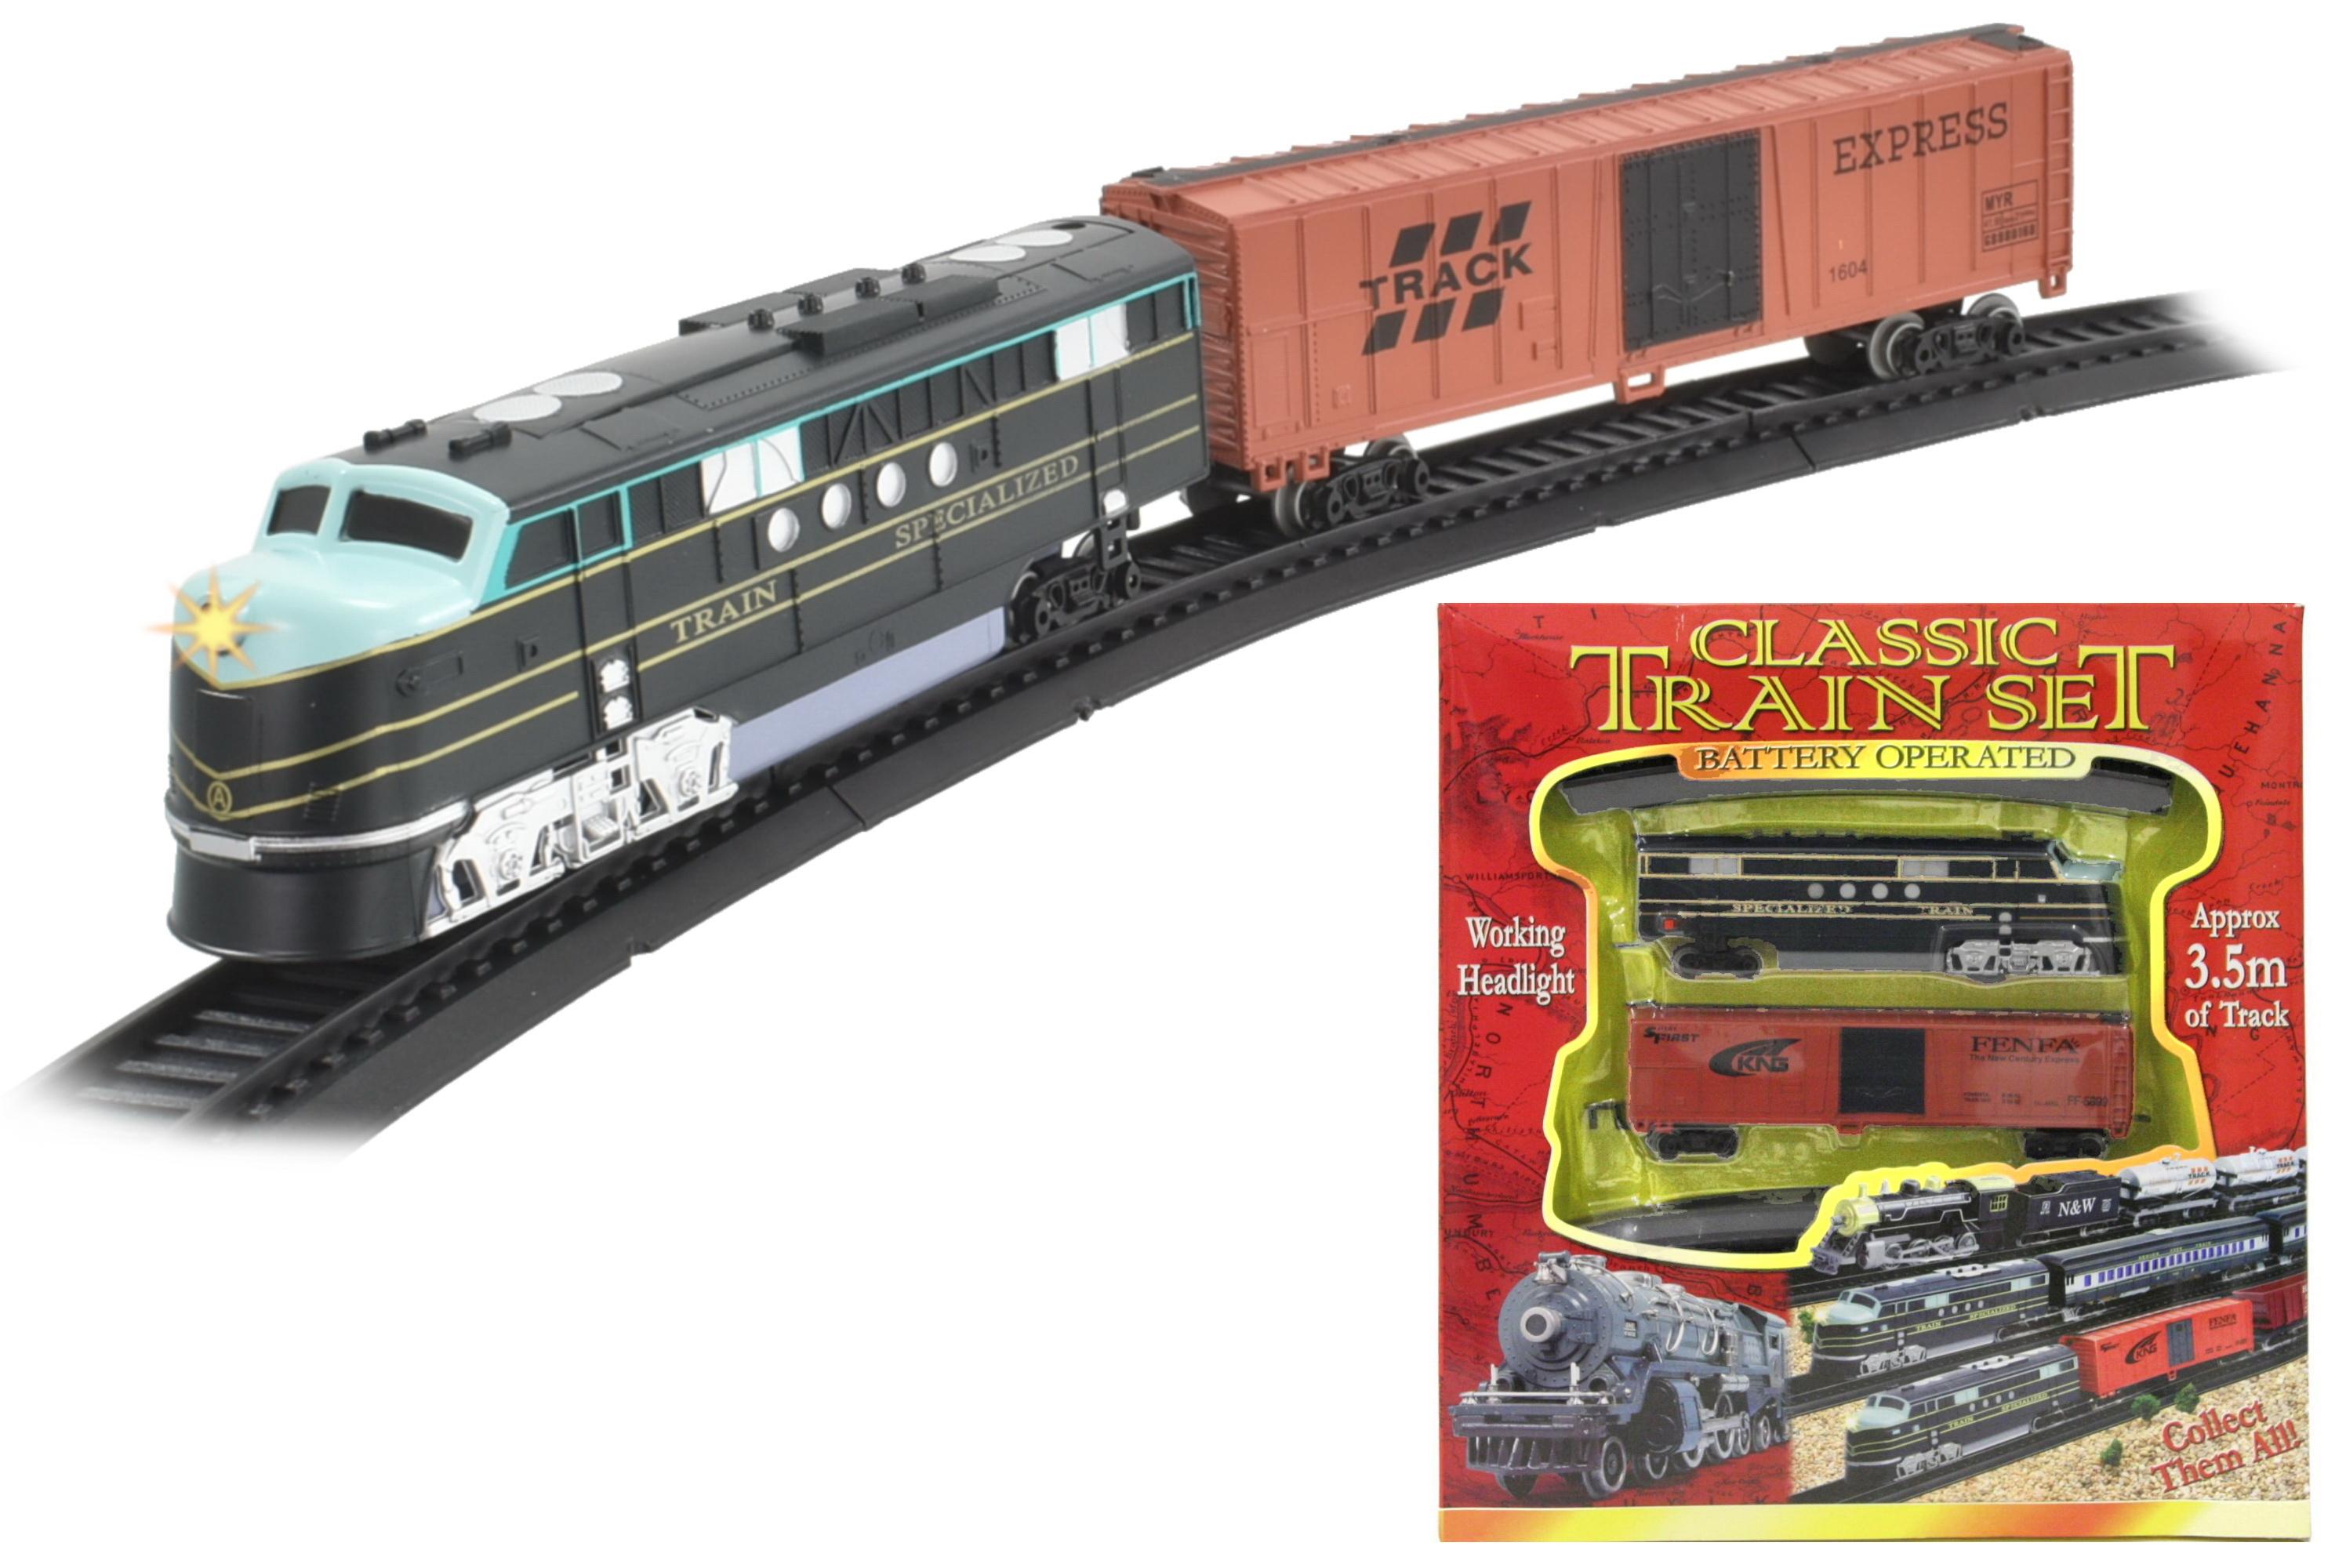 B/O Train Set - Light Up (3 Asst) - W/Box (29cm x 33cm)